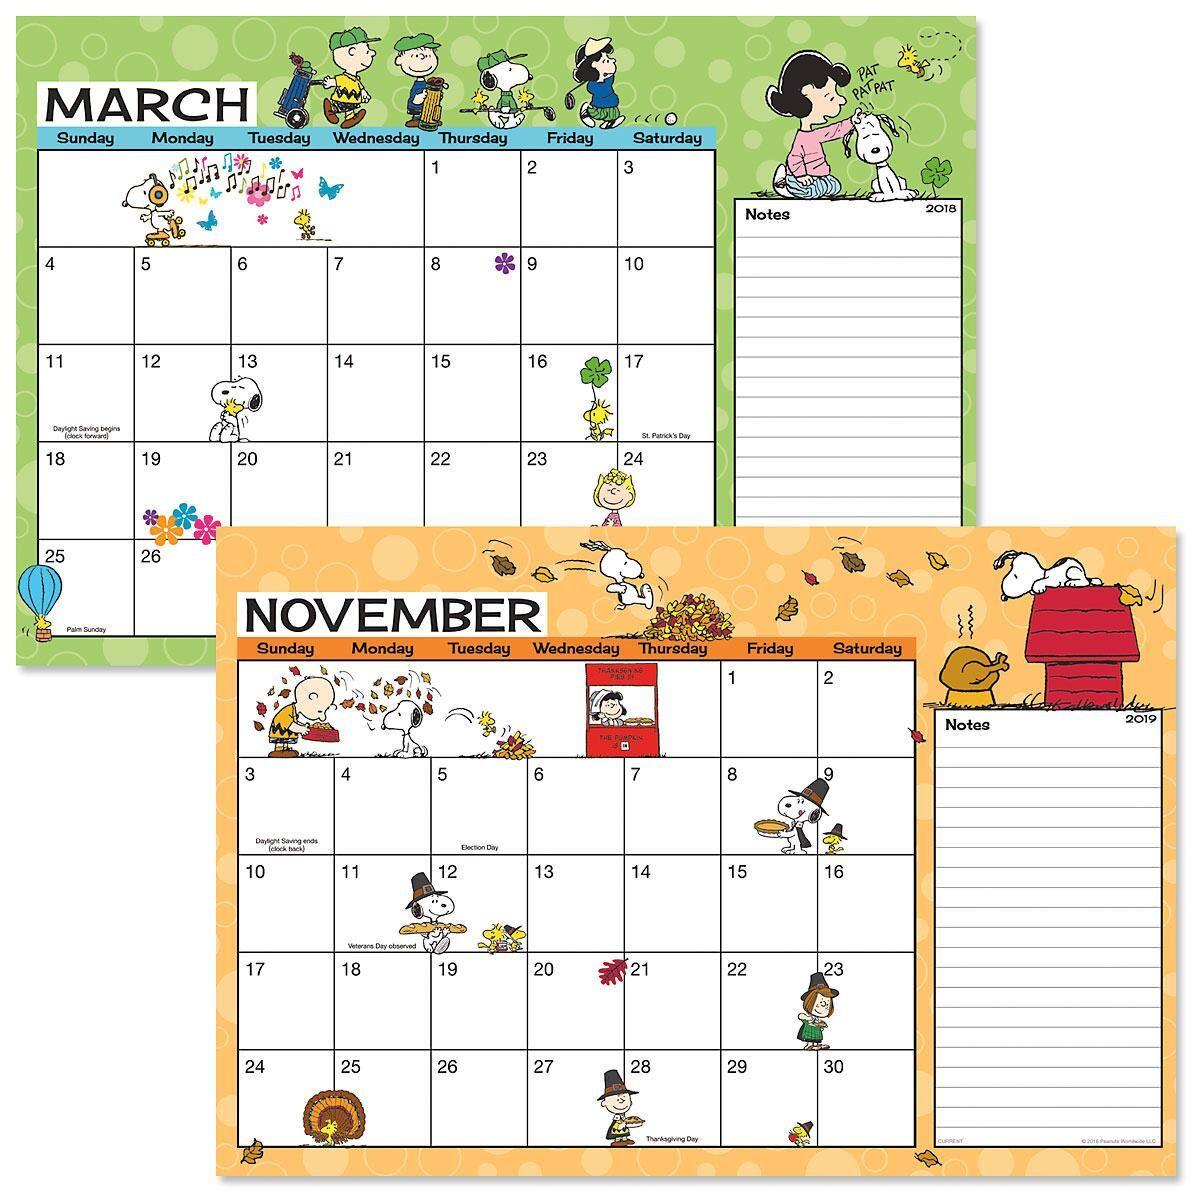 Personalized Desk Calendars Photos Personalized Photo Wall Calendars 2018 Vistaprint Peanuts 2018 2019 Calendar Pad Colorful Images